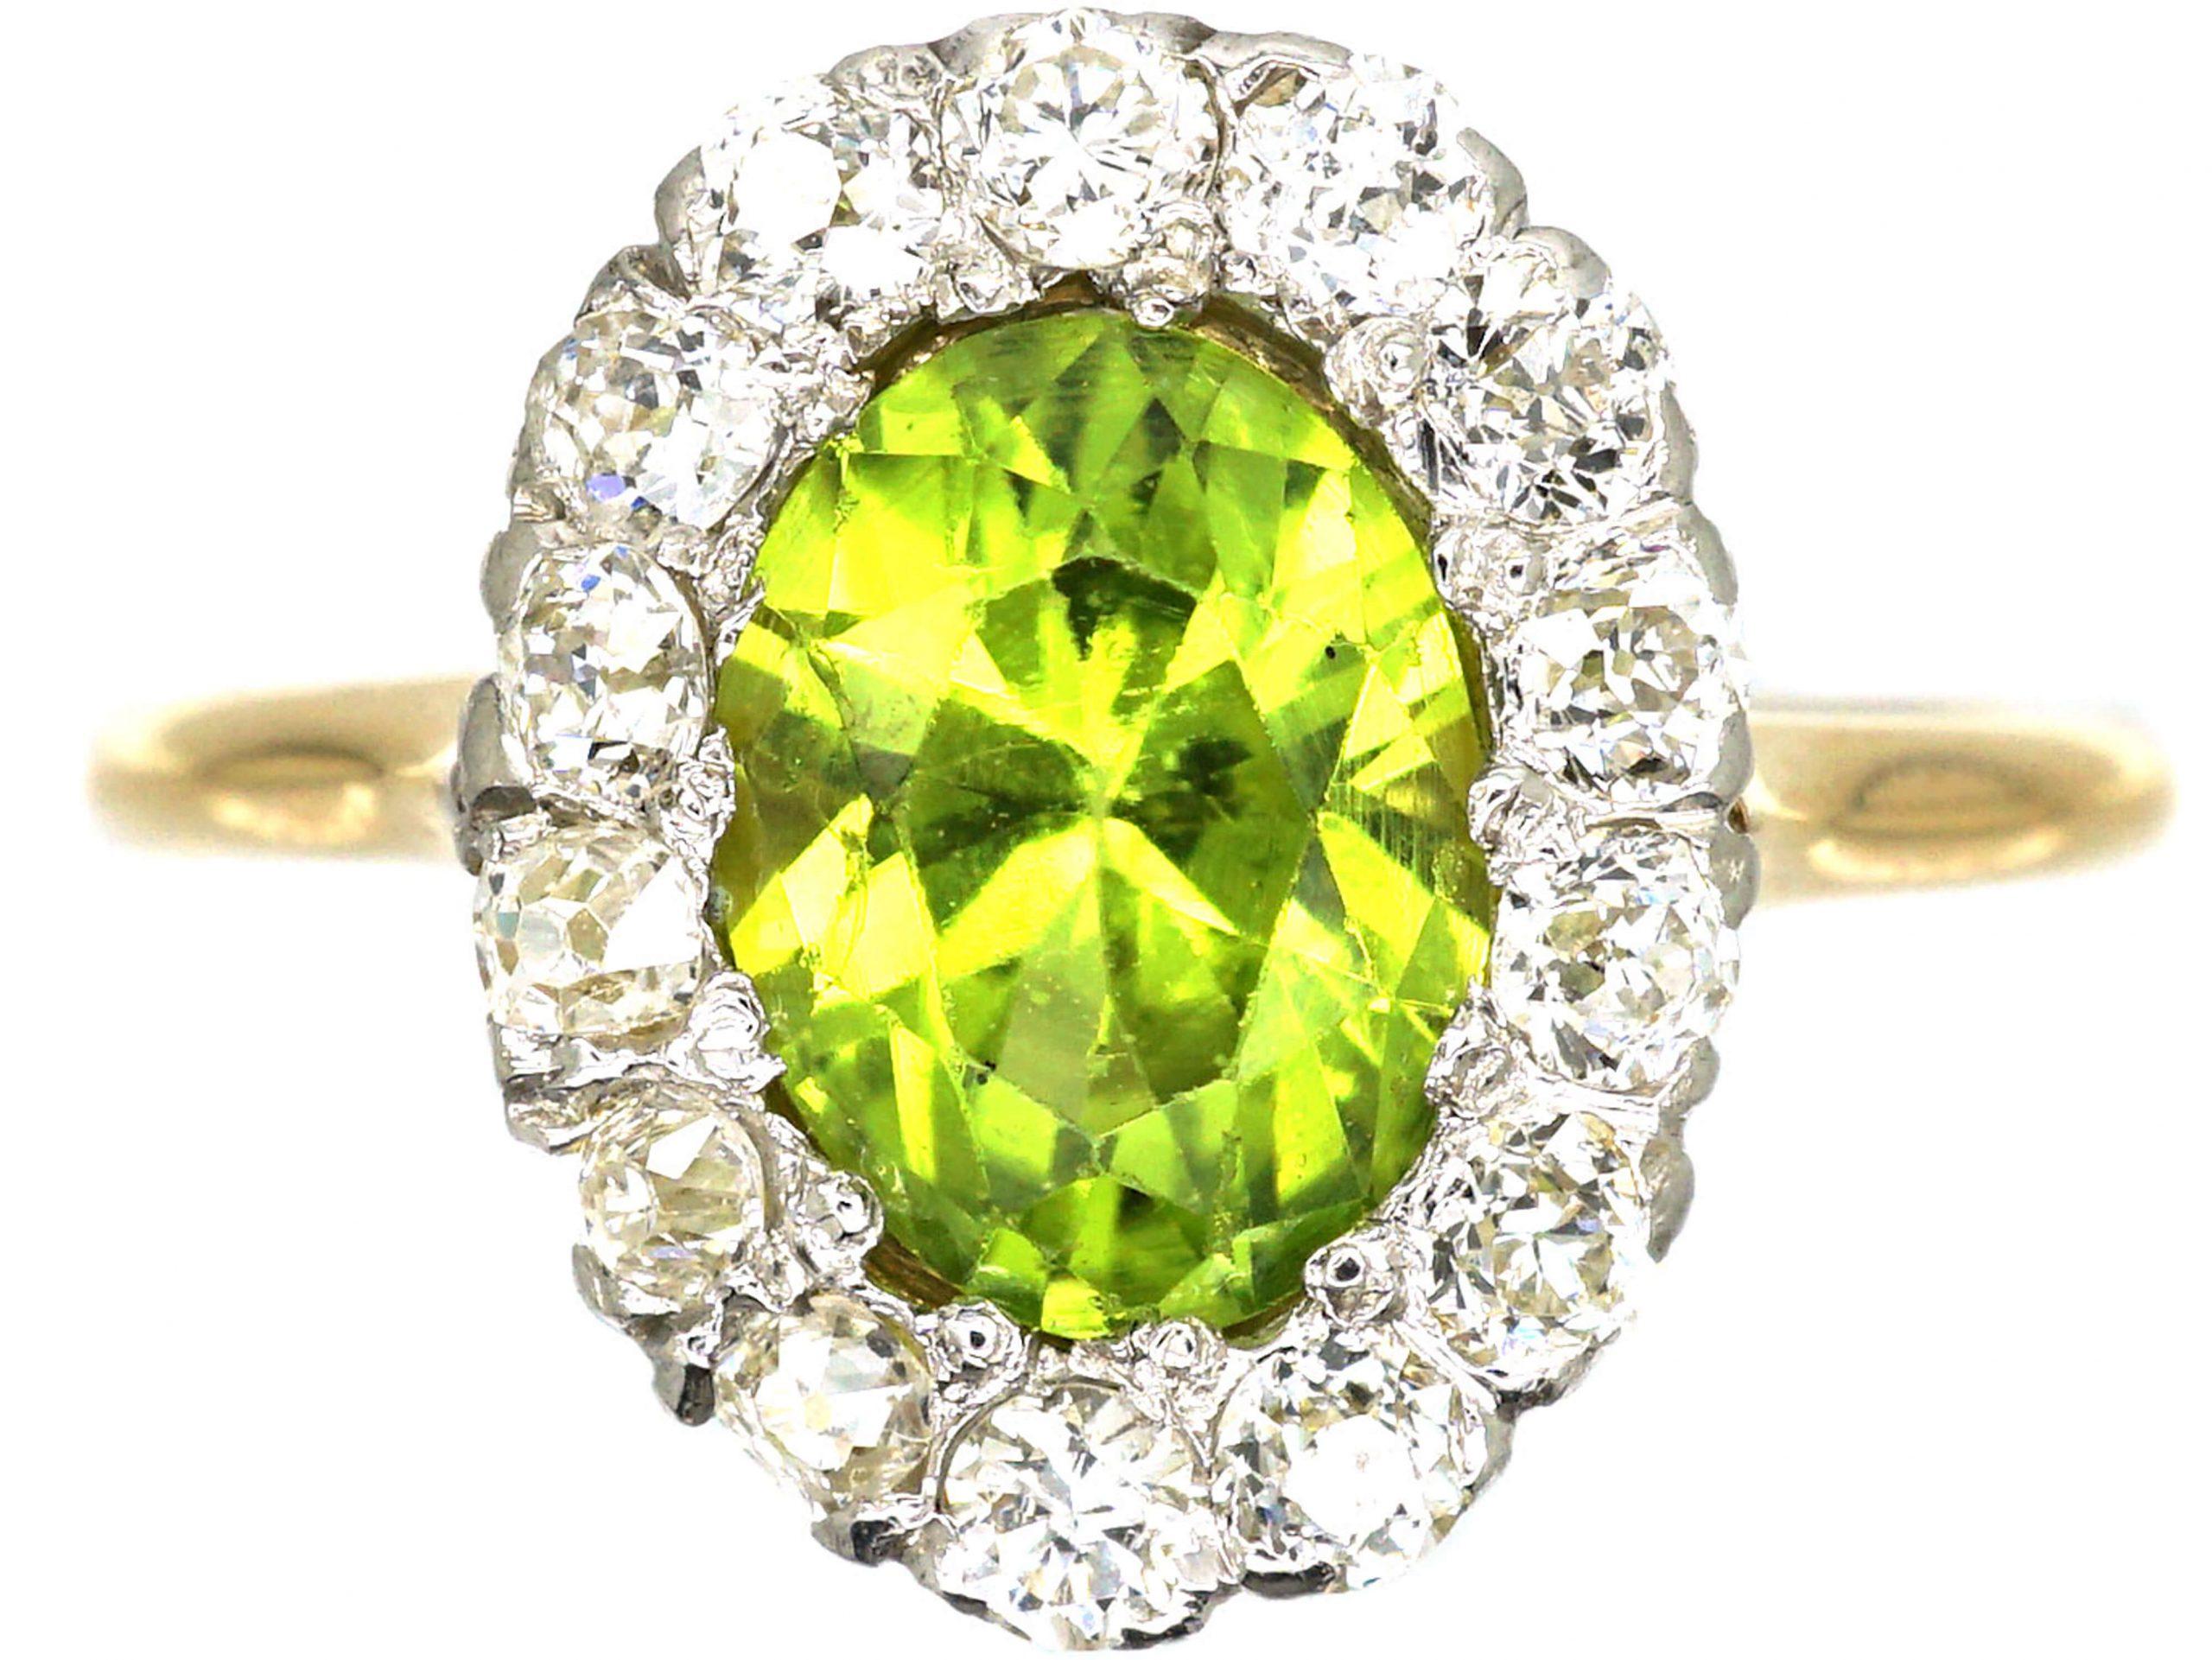 18ct Gold, Peridot & Diamond Oval Cluster Ring